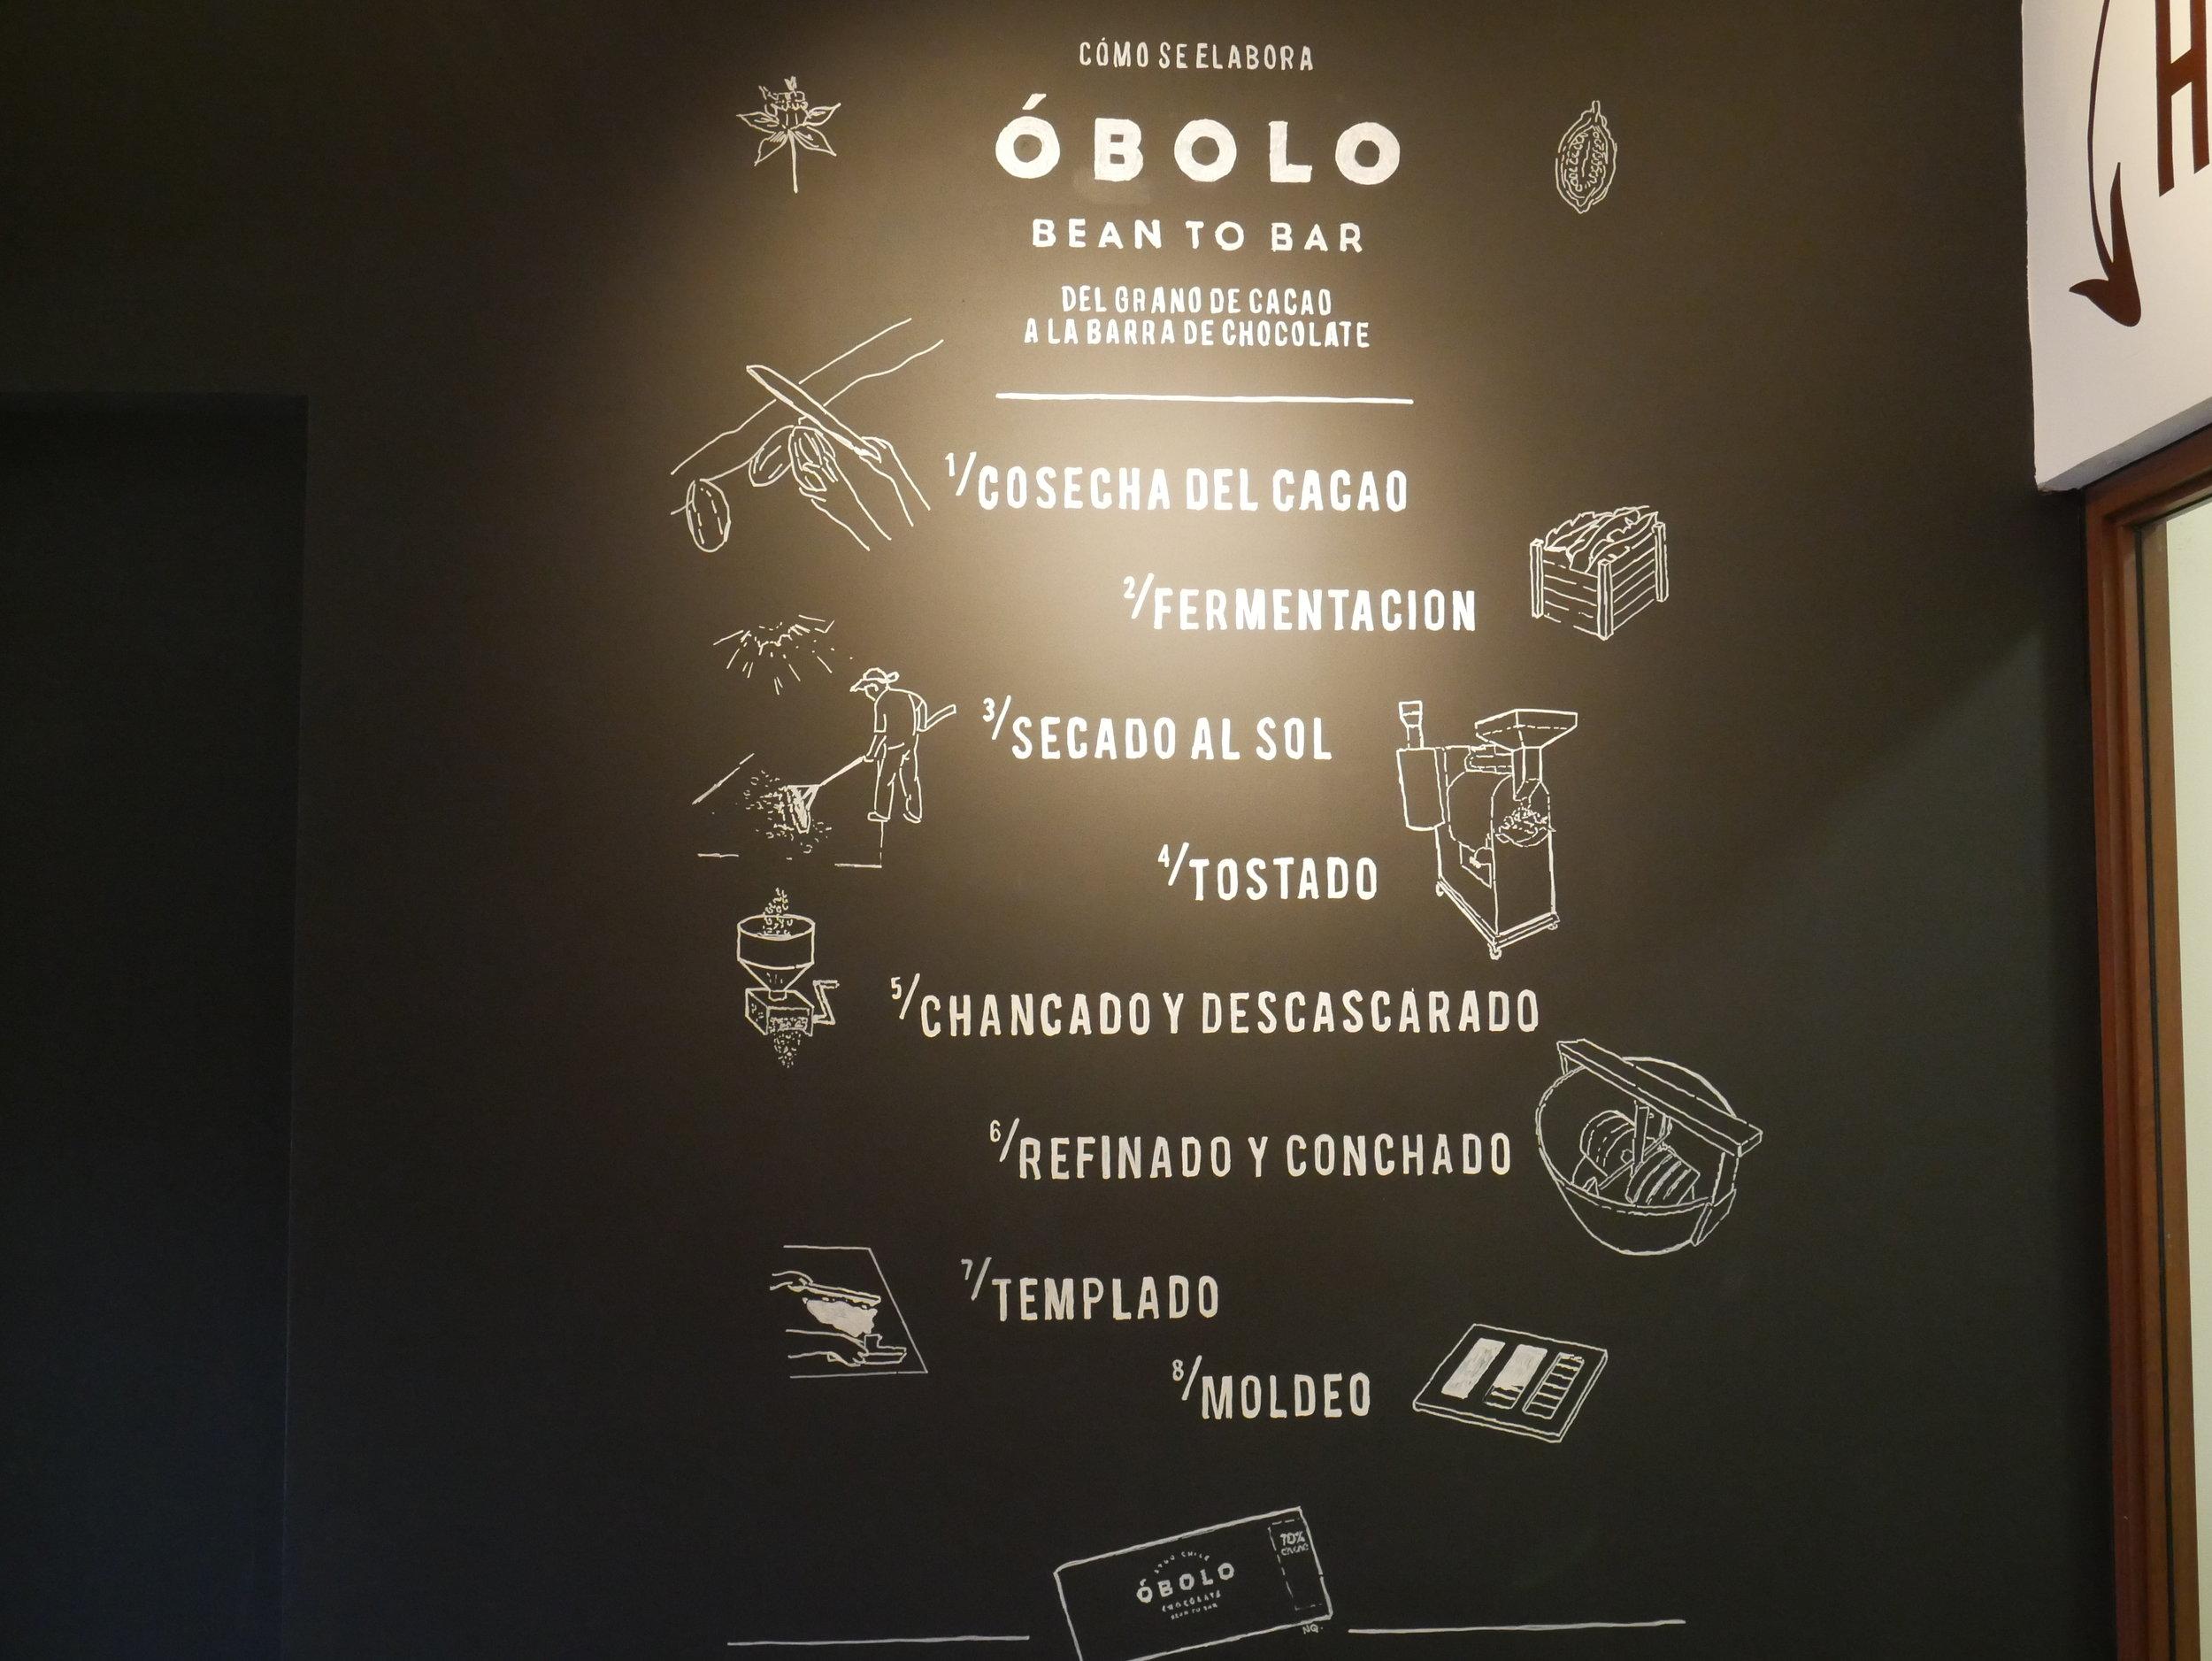 OboloInterior2.JPG